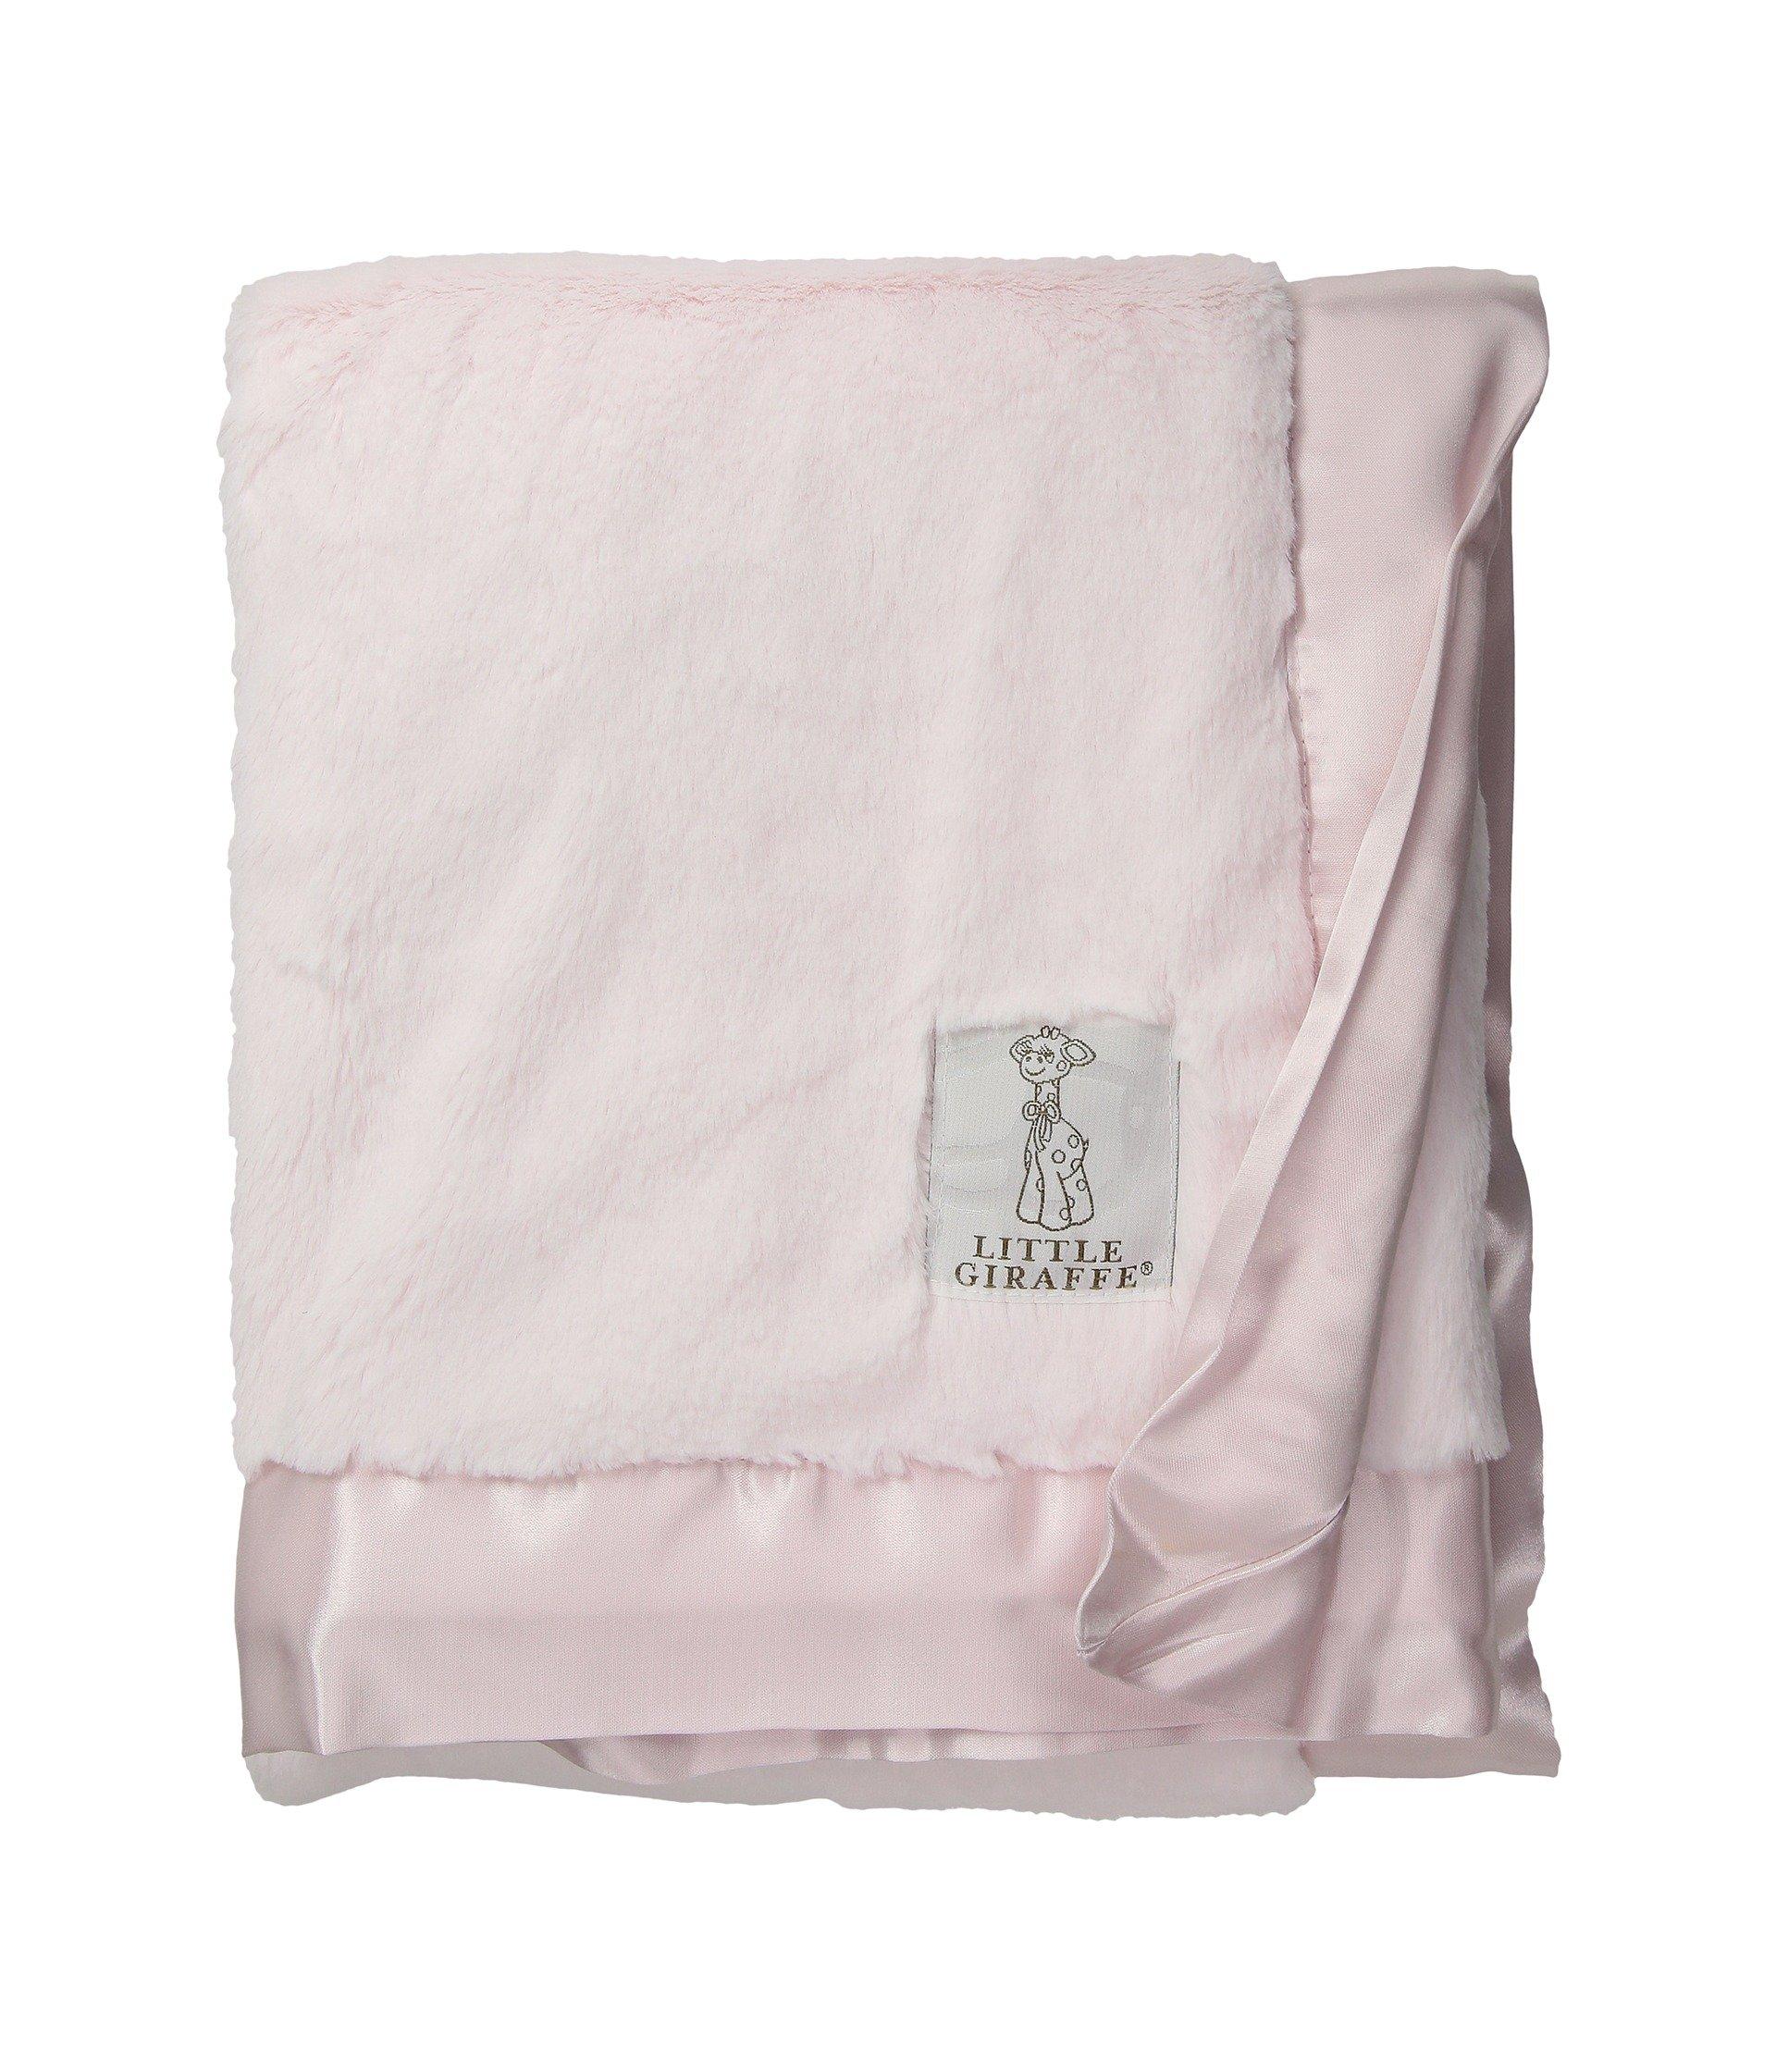 Little Giraffe Luxe Stroller Baby Blanket, Pink, 29'' x 35'' by Little Giraffe